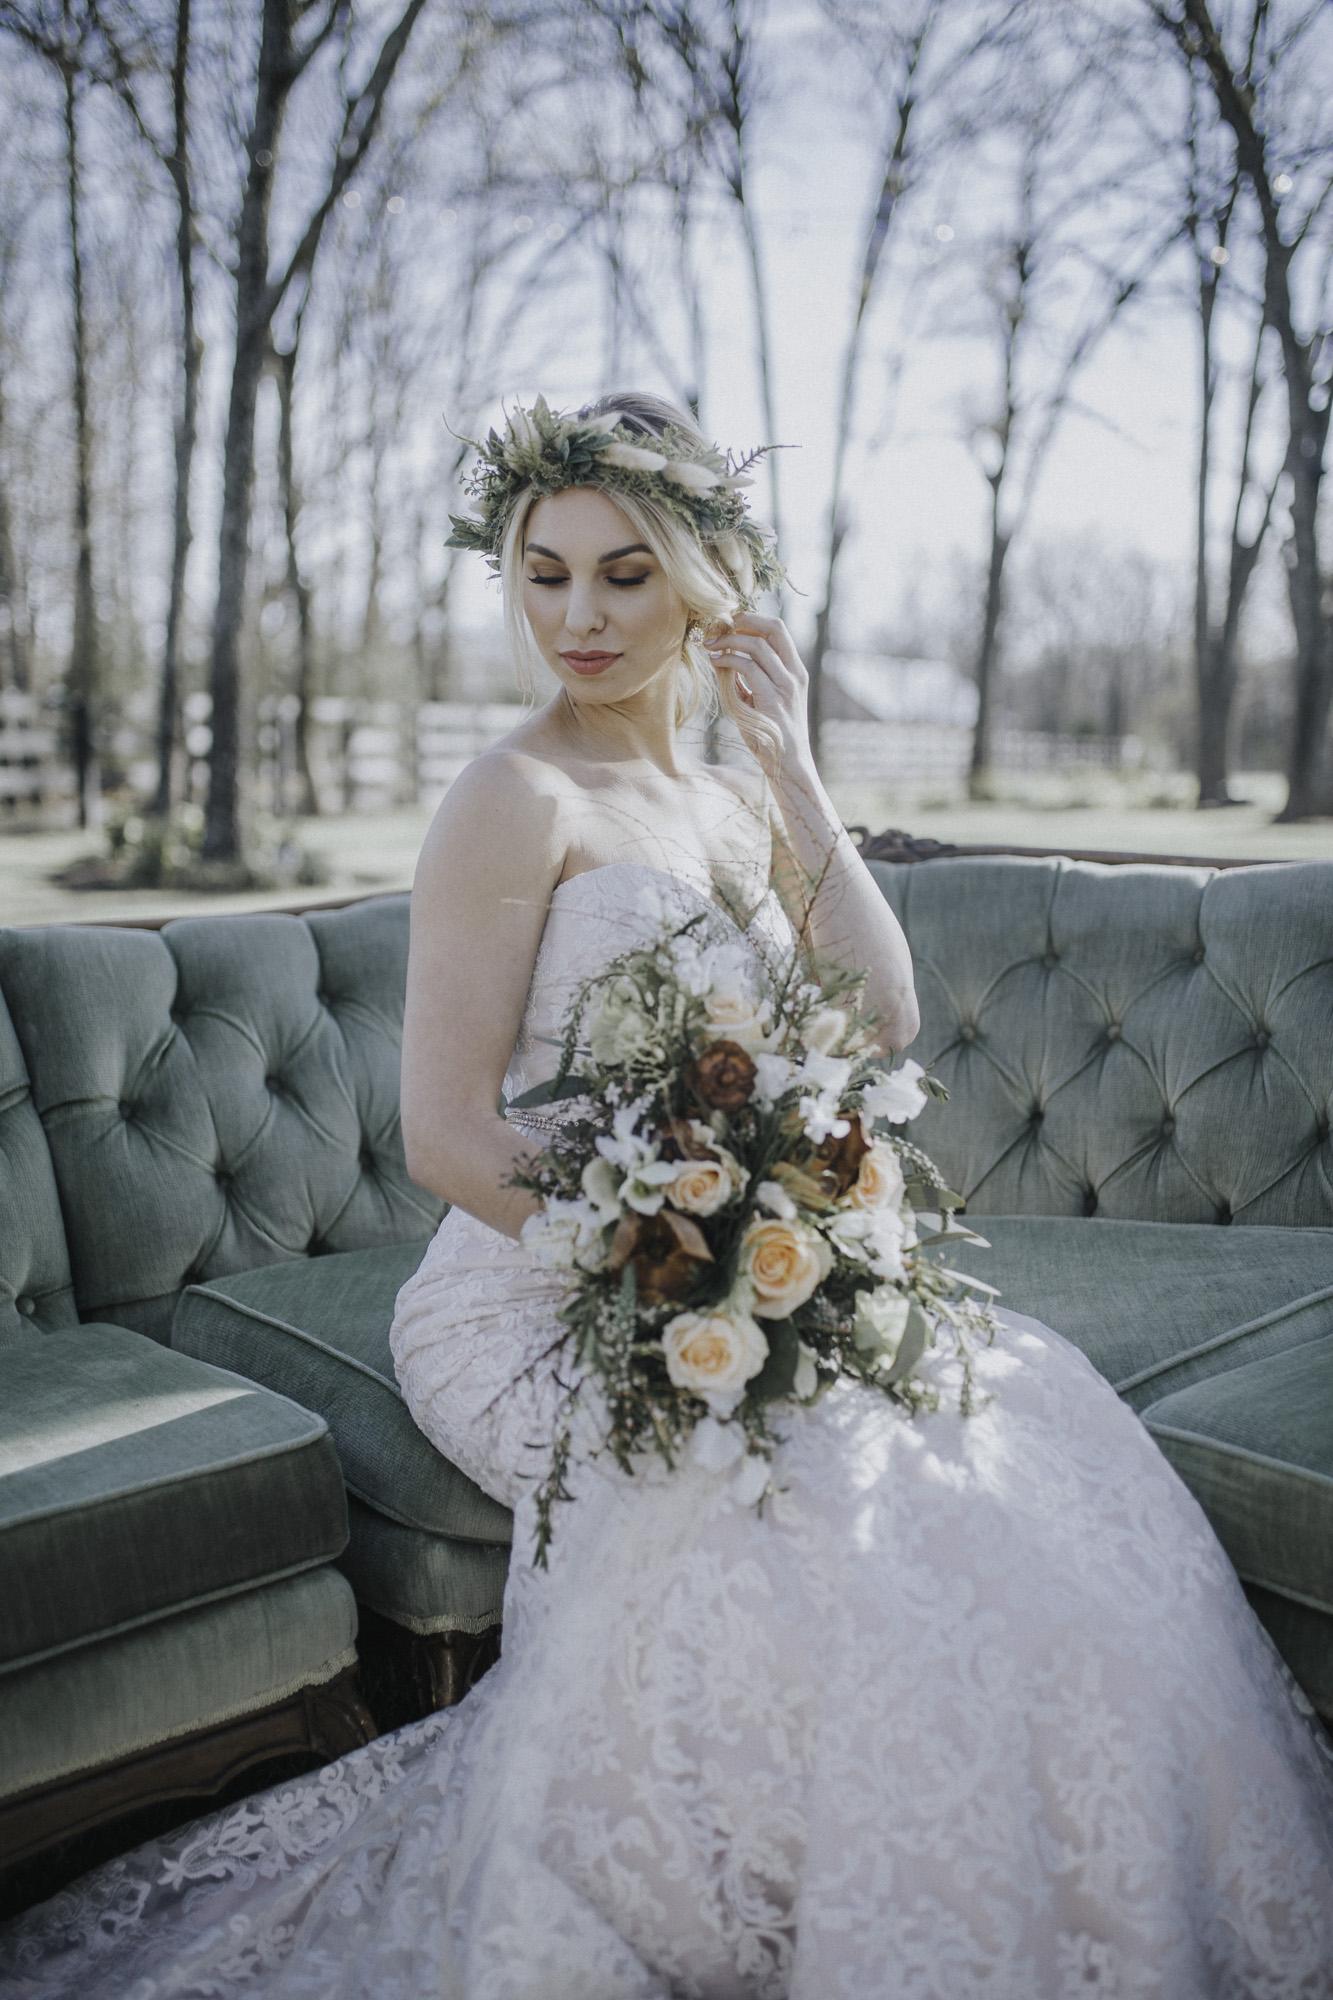 Cate_Ann_Photography_Dayton_Ohio_Wedding_Elopement_And_Engagement_PhotographerIMG_8585.jpg